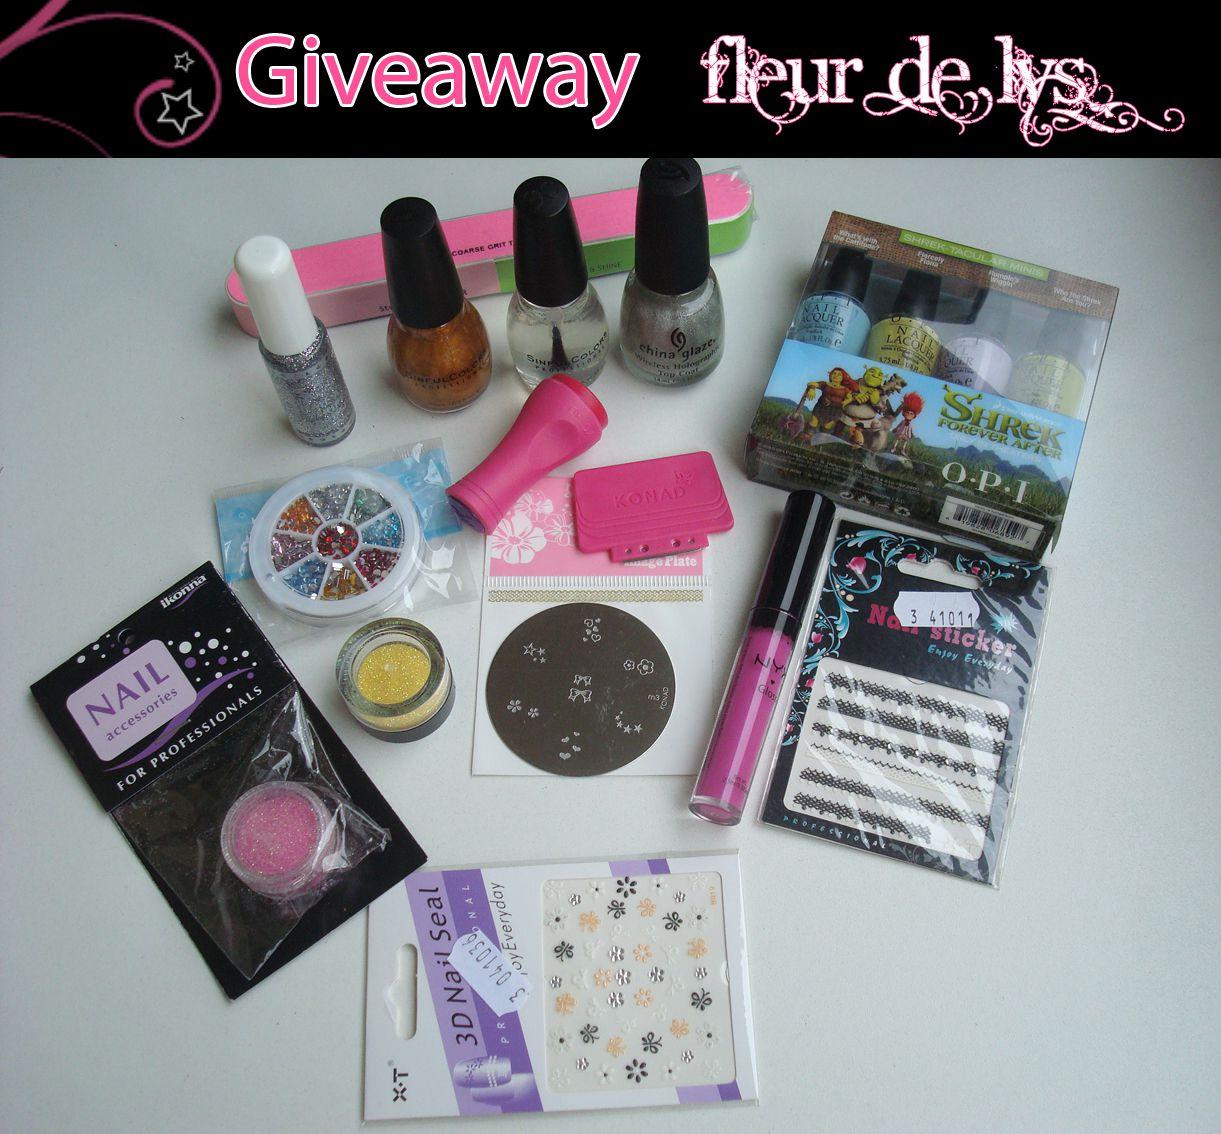 http://idata.over-blog.com/3/38/71/08/Giveaway/Giveaway-Fleur-de-Lys.jpg